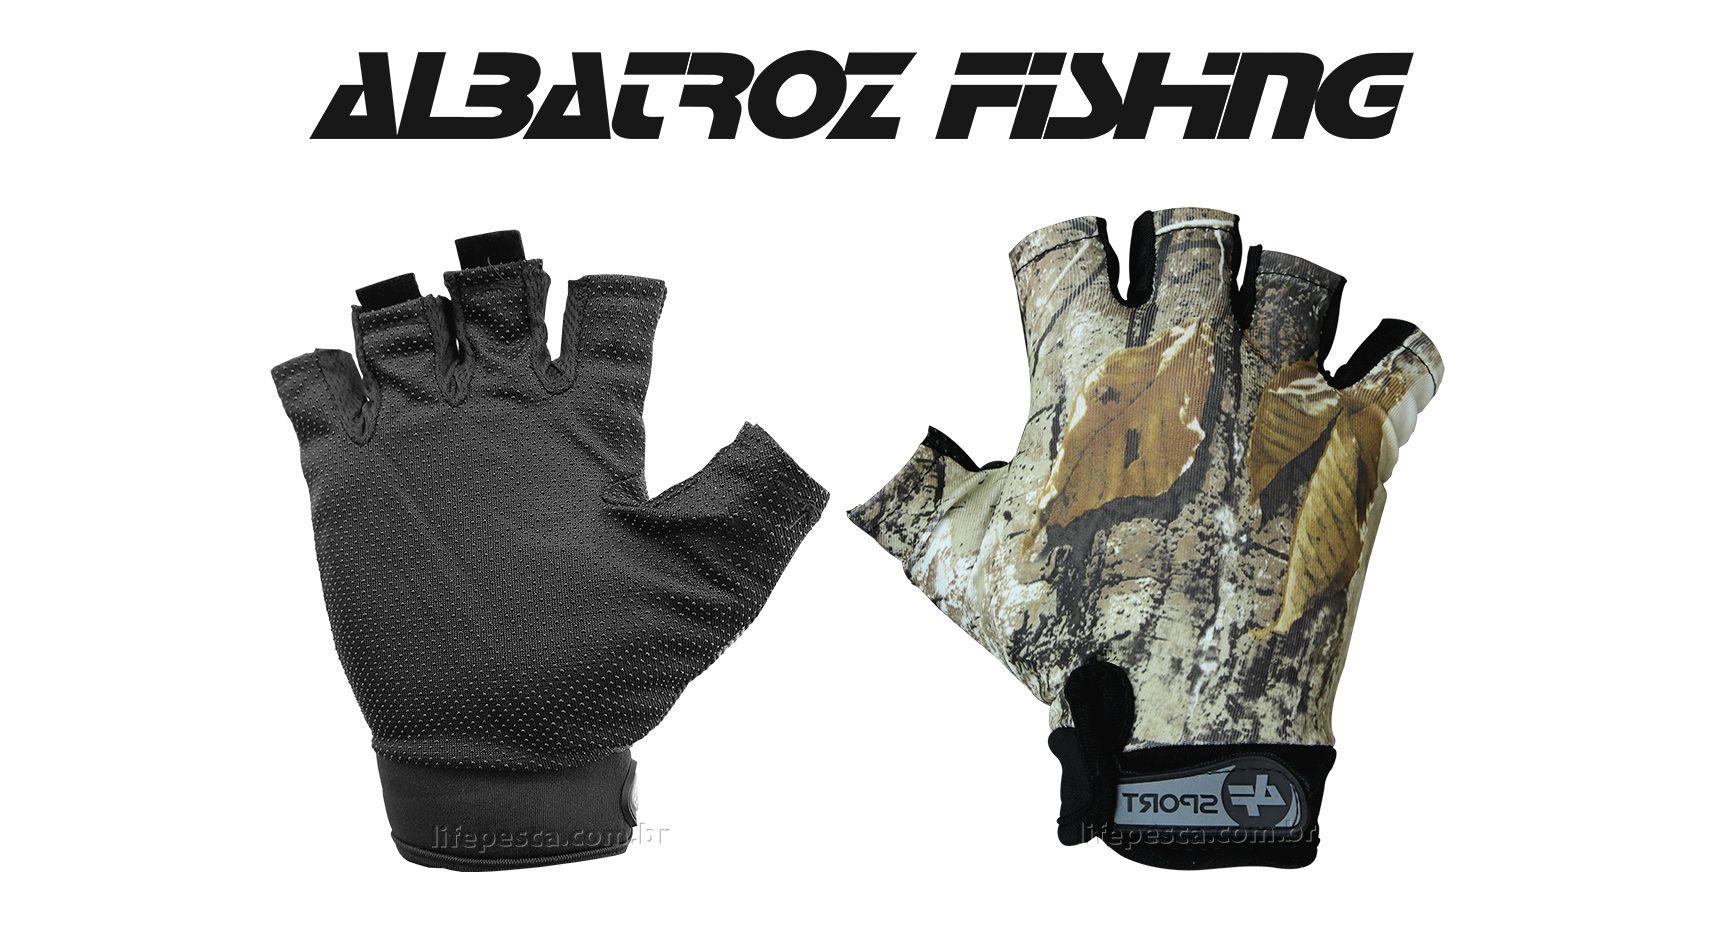 Luva Meio Dedo YL015 - Albatroz Fishing - Camuflada